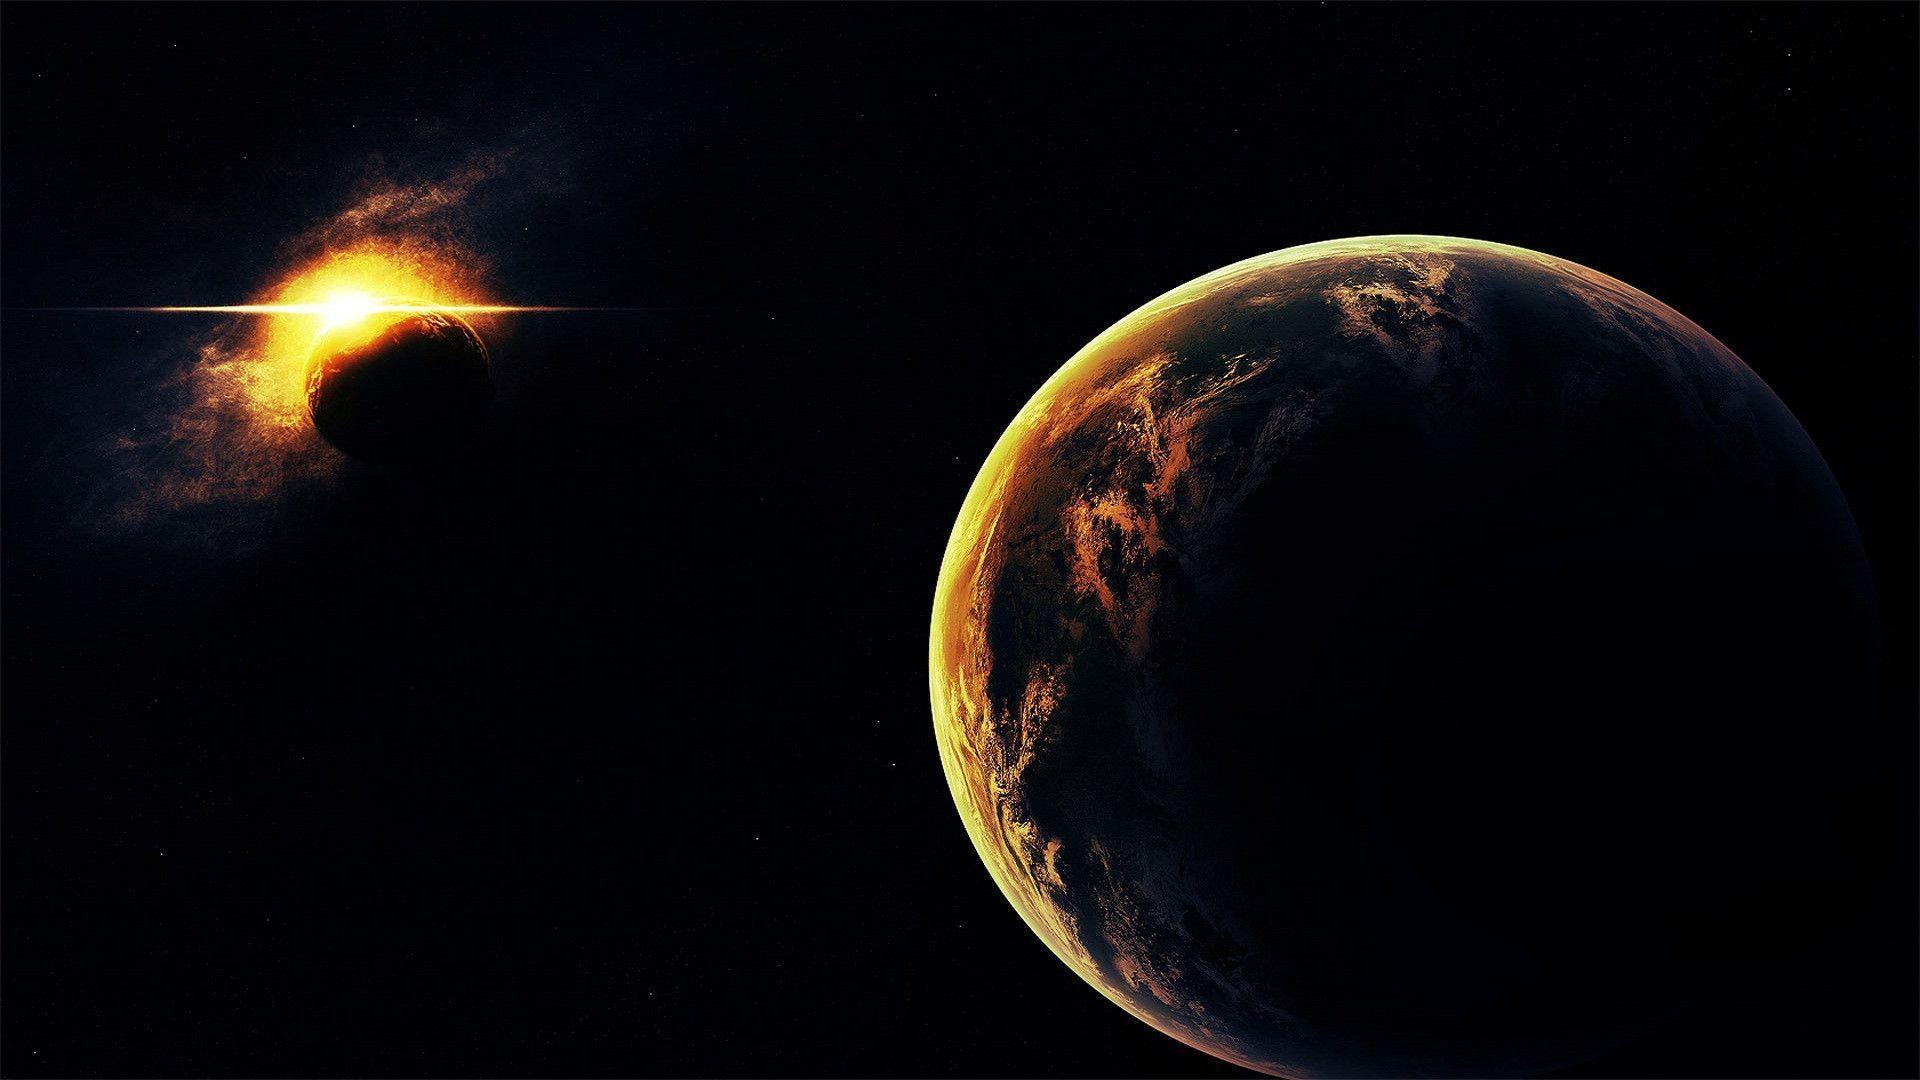 Lunar Eclipse Wallpapers - Wallpaper Cave